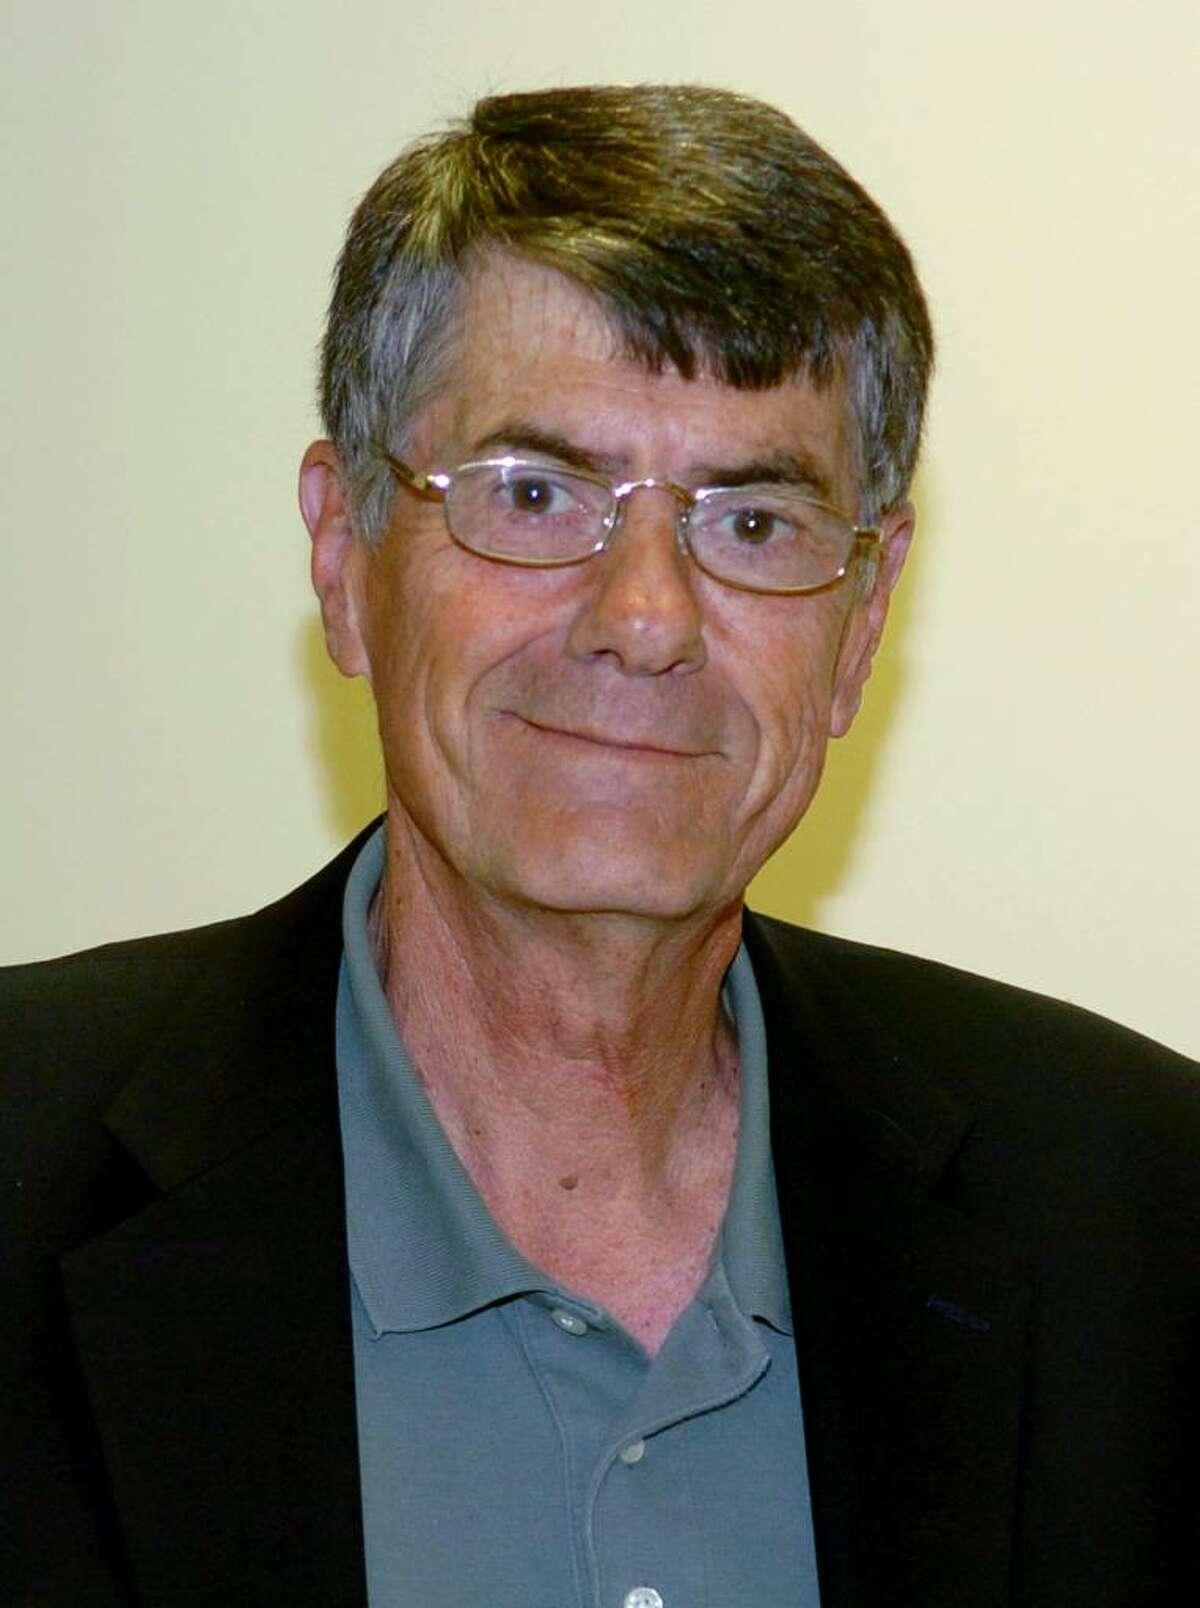 Fairfield Selectman Ralph Bowley at Board of Selectman meeting on Wednesday Oct. 07, 2009.